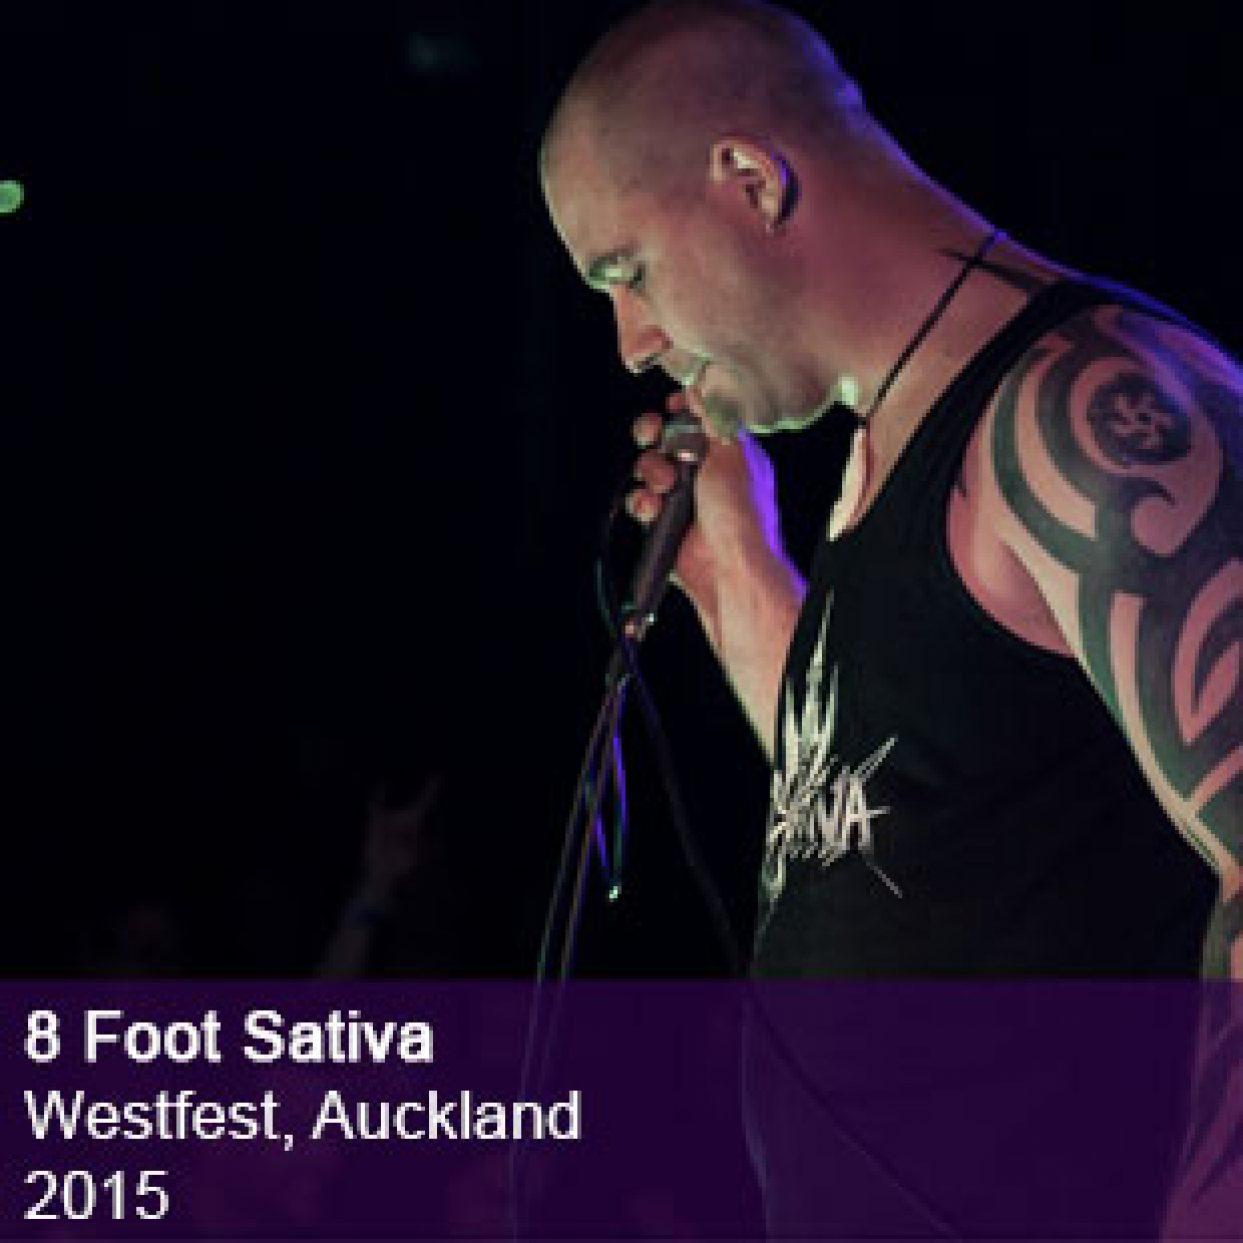 8 Foot Sativa live